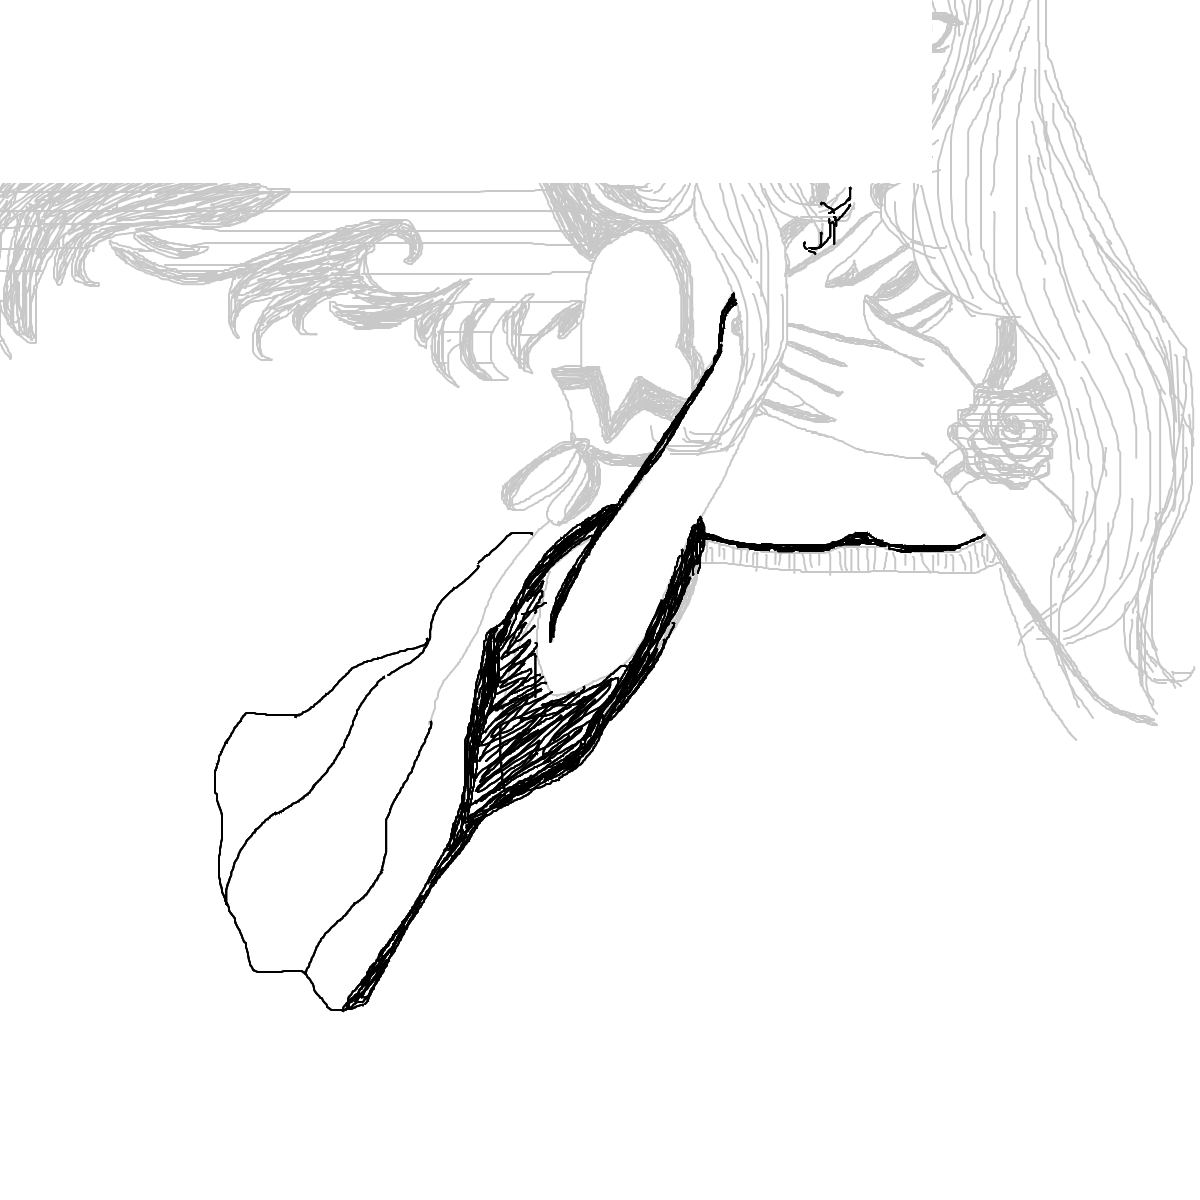 BAAAM drawing#23445 lat:45.7347488403320300lng: 4.9028925895690920